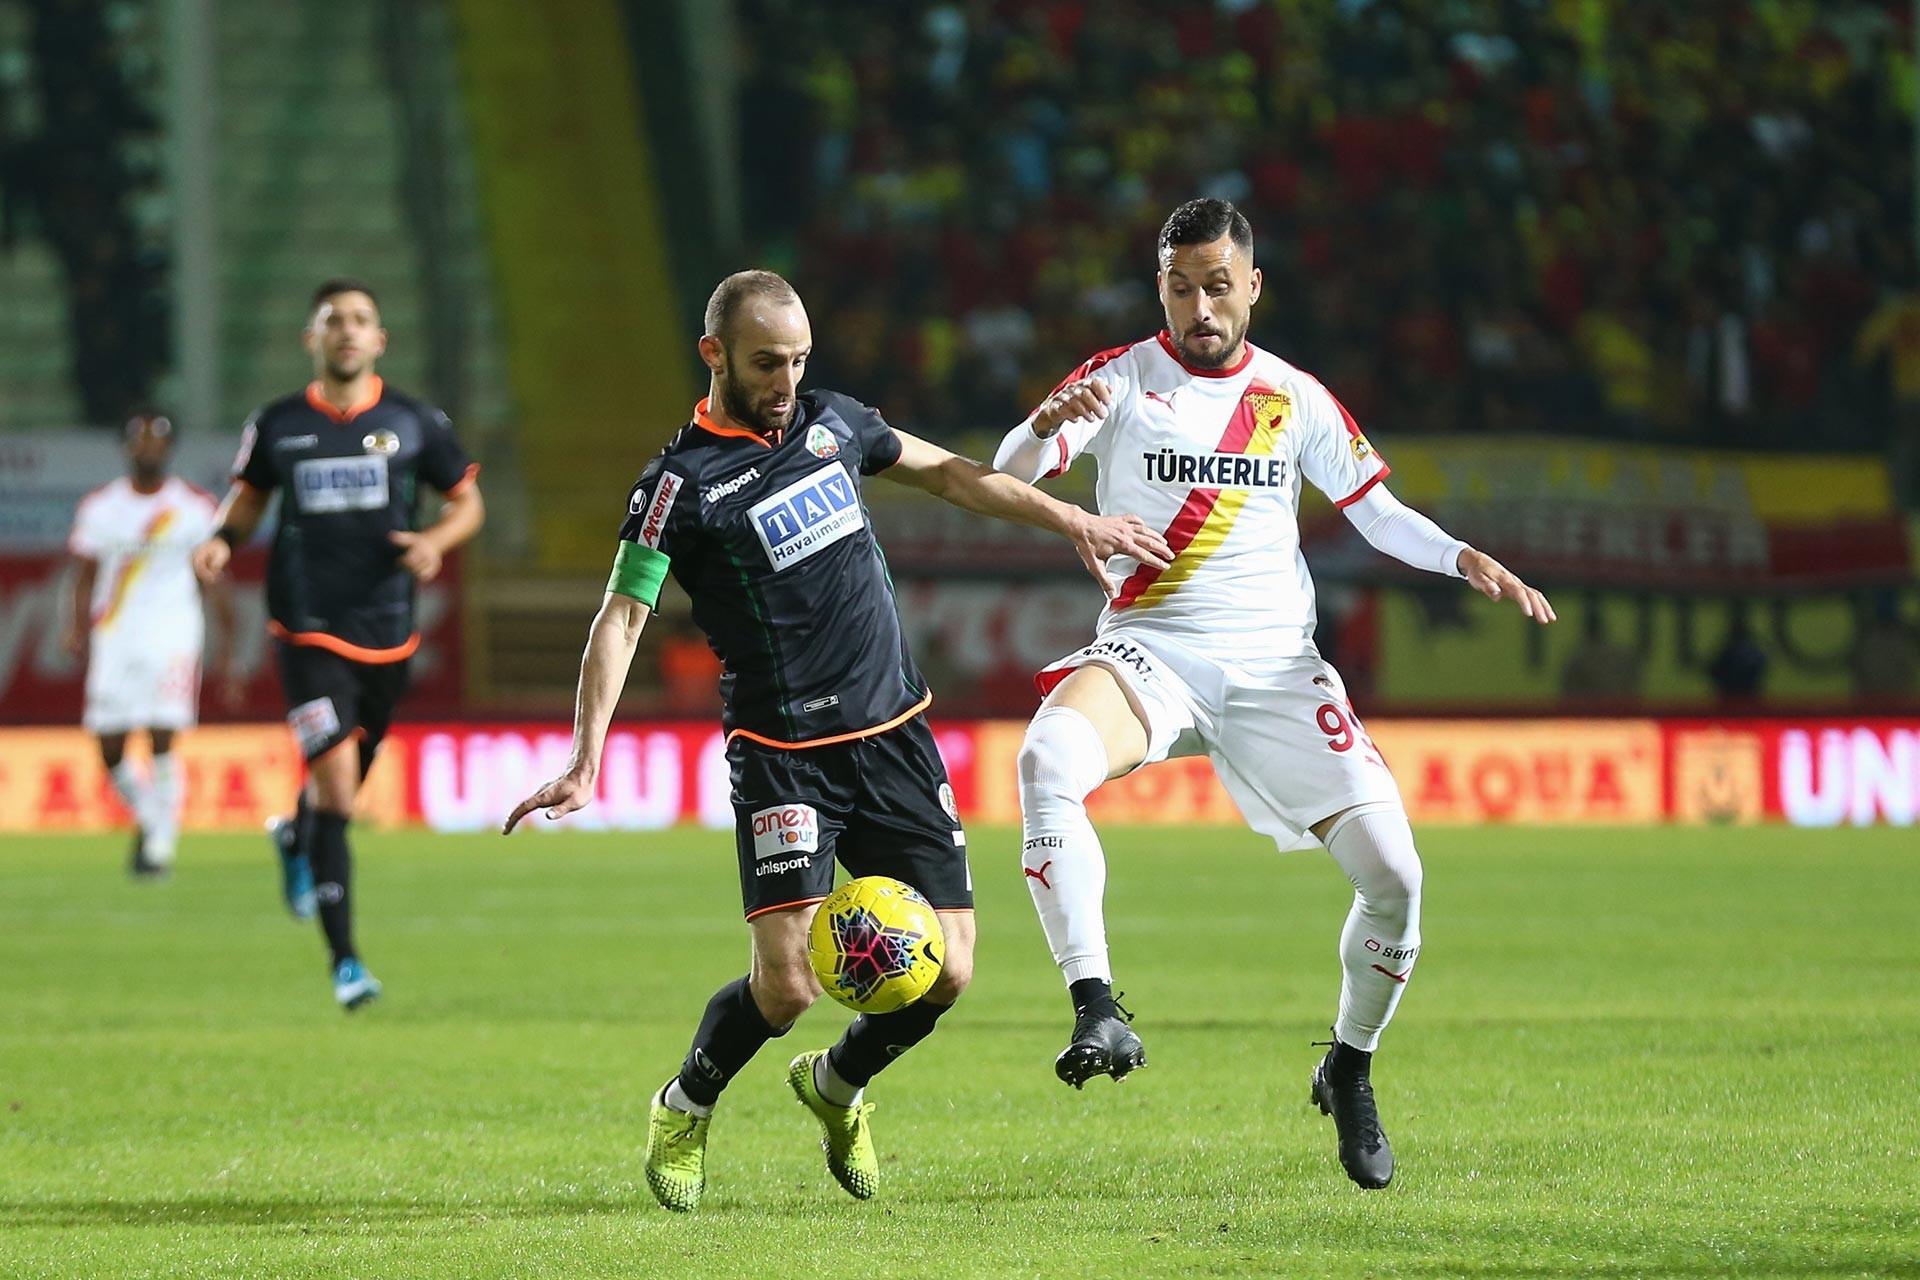 Alanyaspor'da Efecan Karaca rakibi Stefano ile maçta mücadele ederken